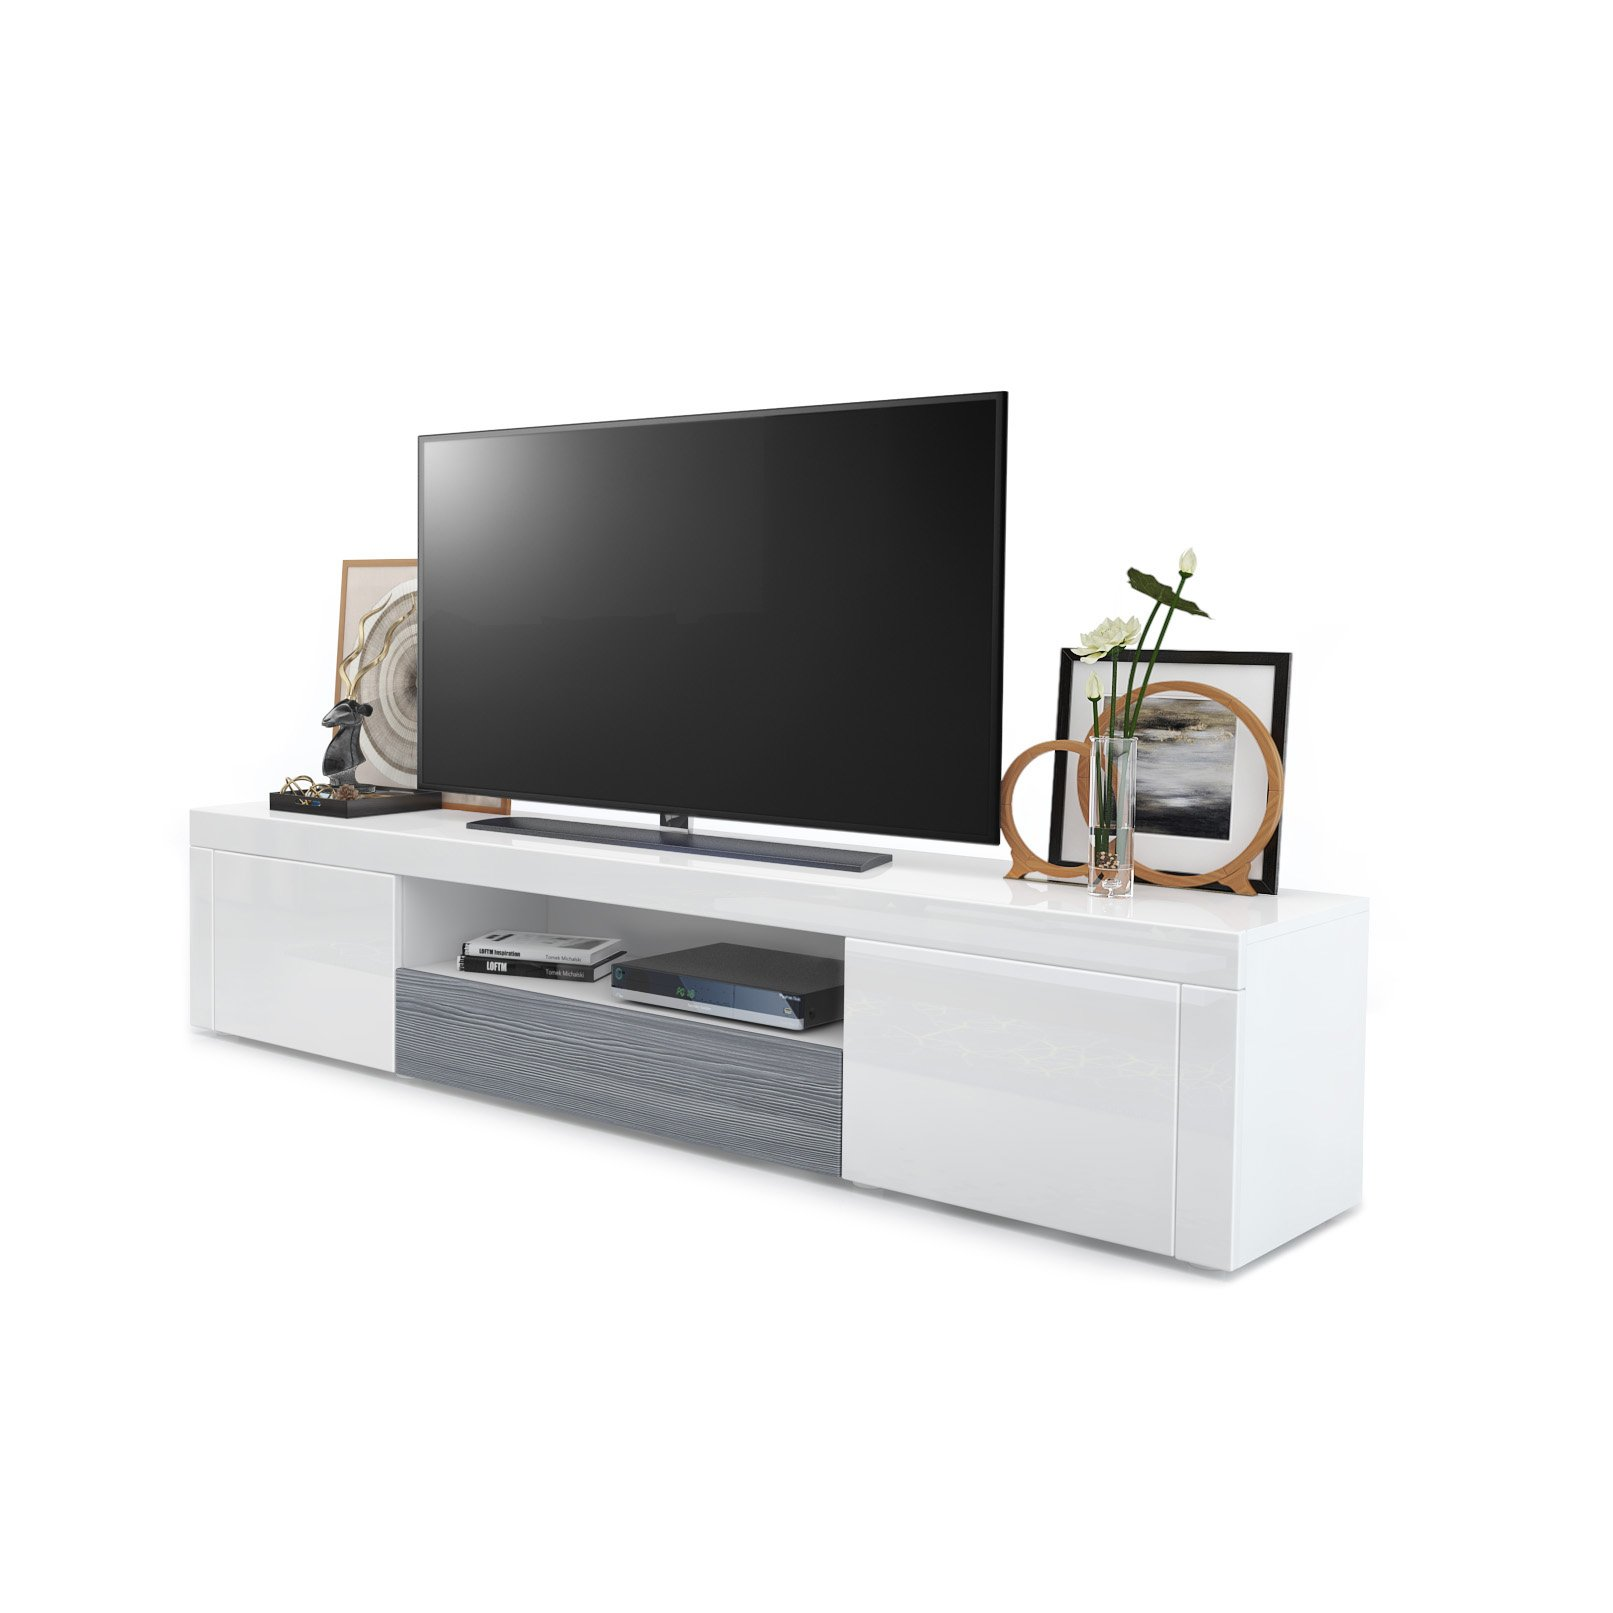 White High Gloss Tv Unit: Amazon.co.uk